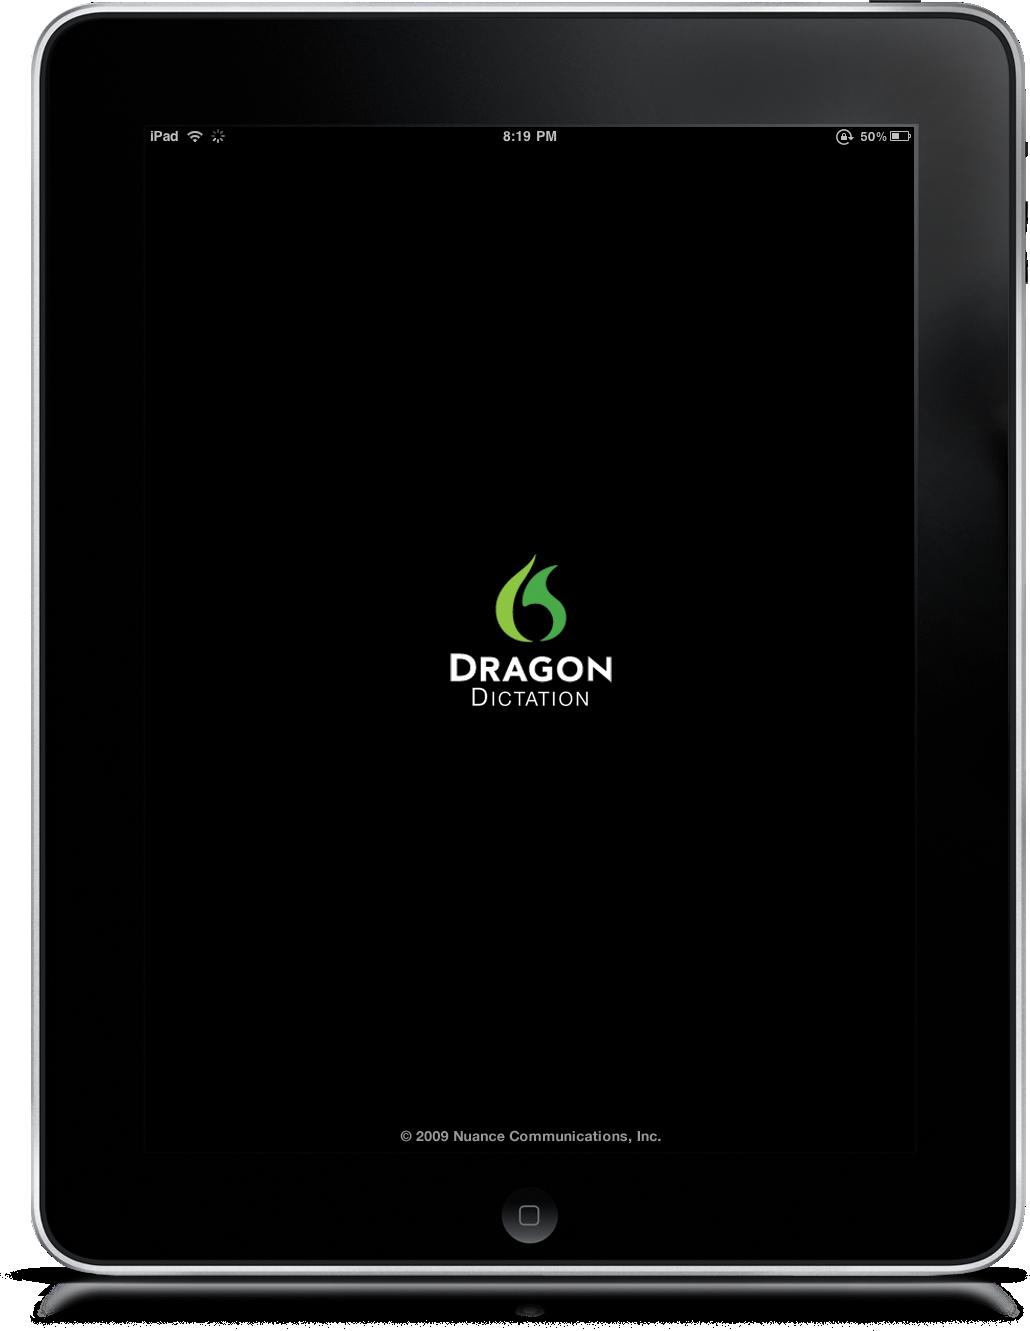 Dragon Dictation